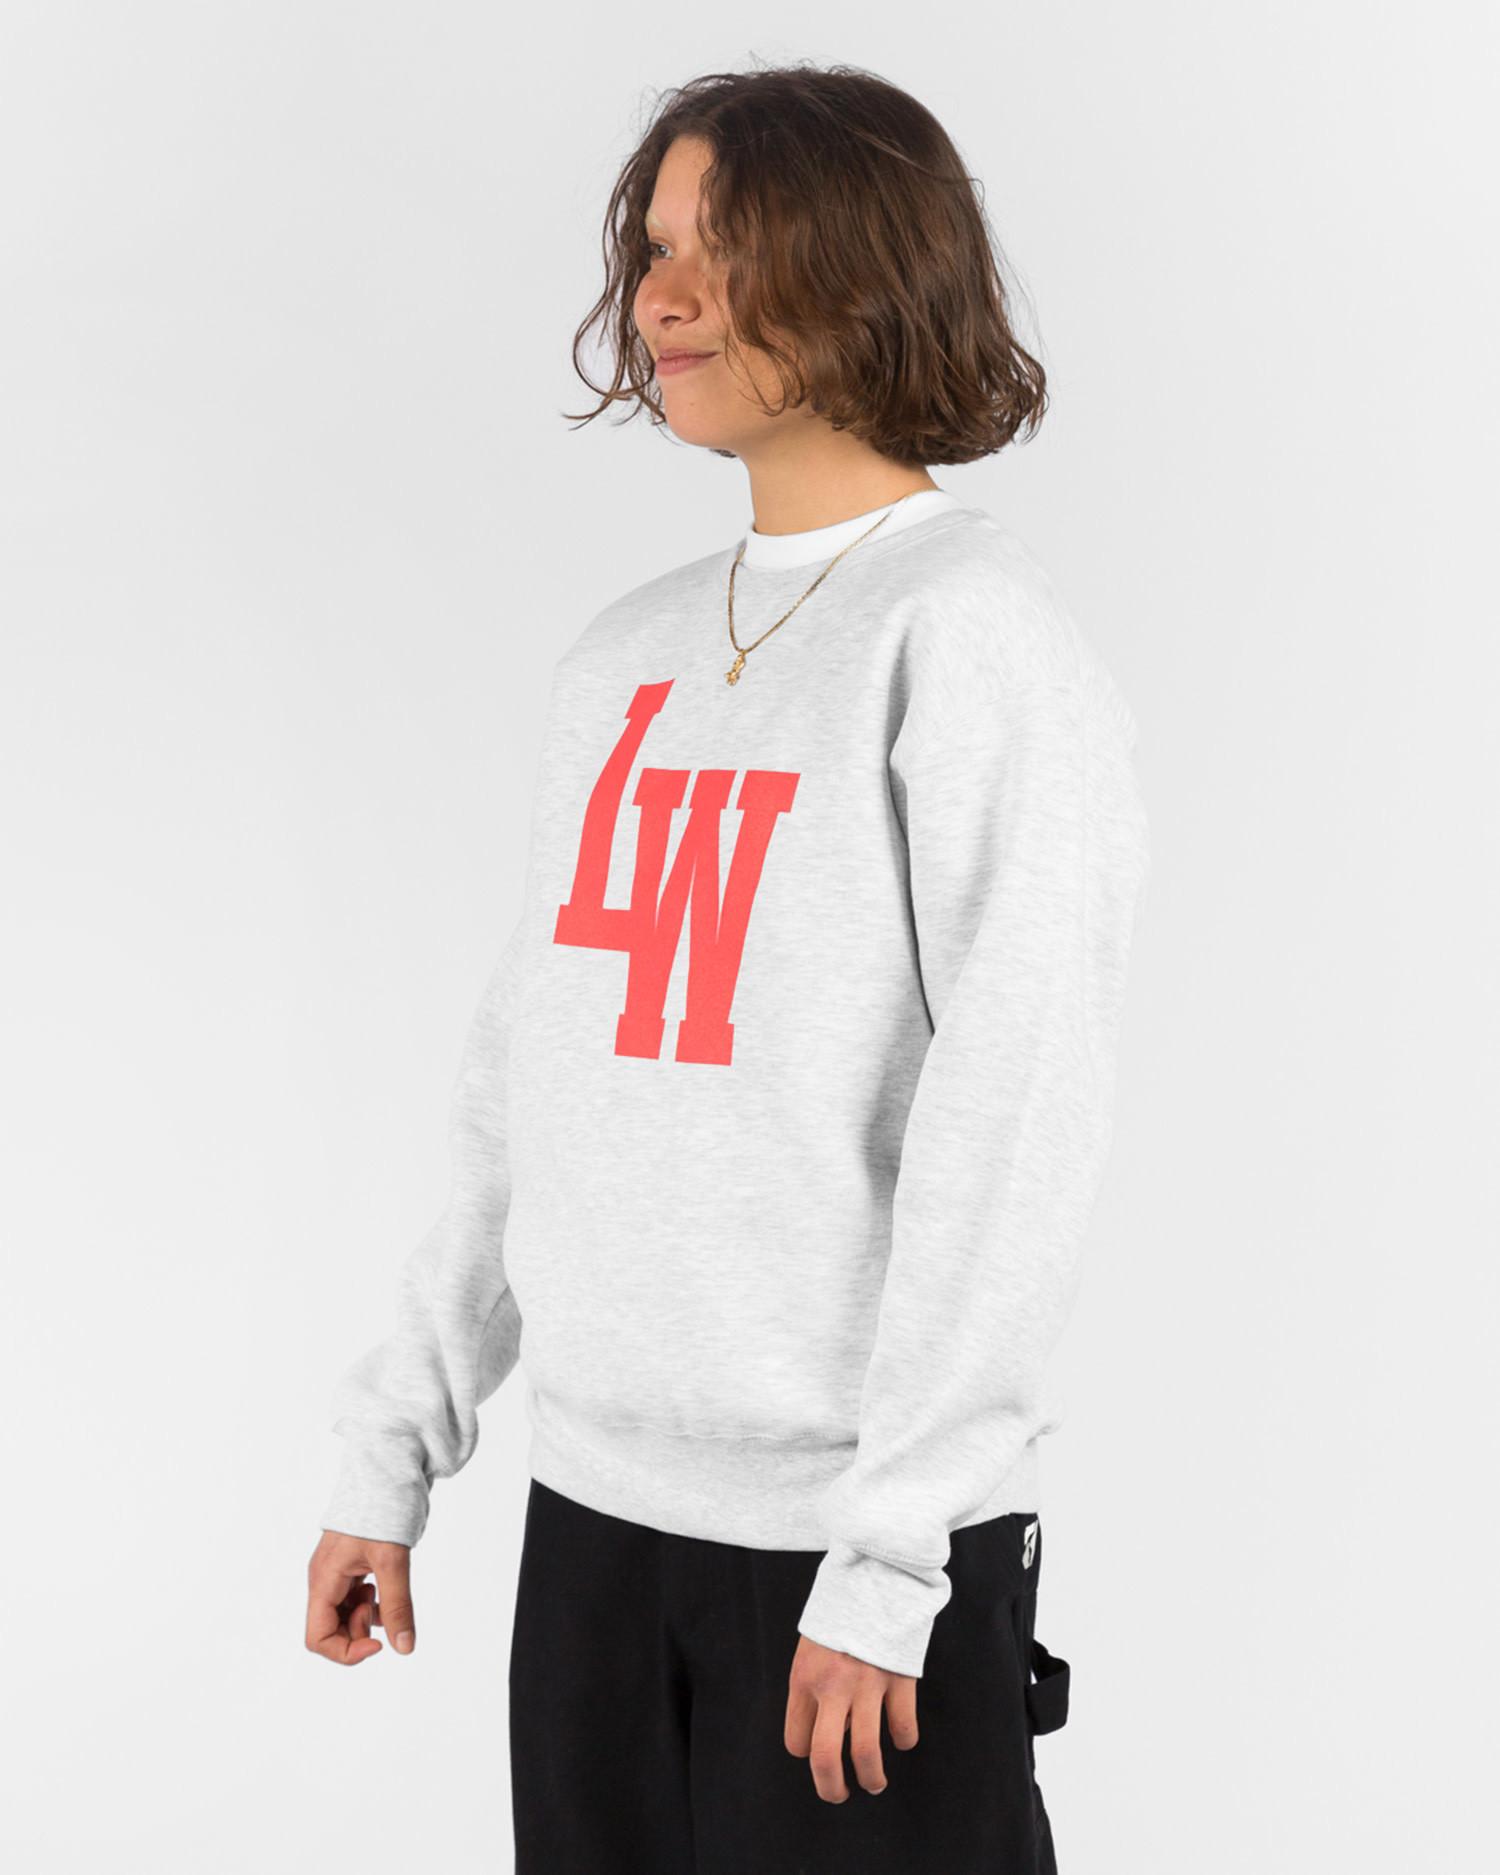 Lockwood LW Varsity Crewneck Grey/Red